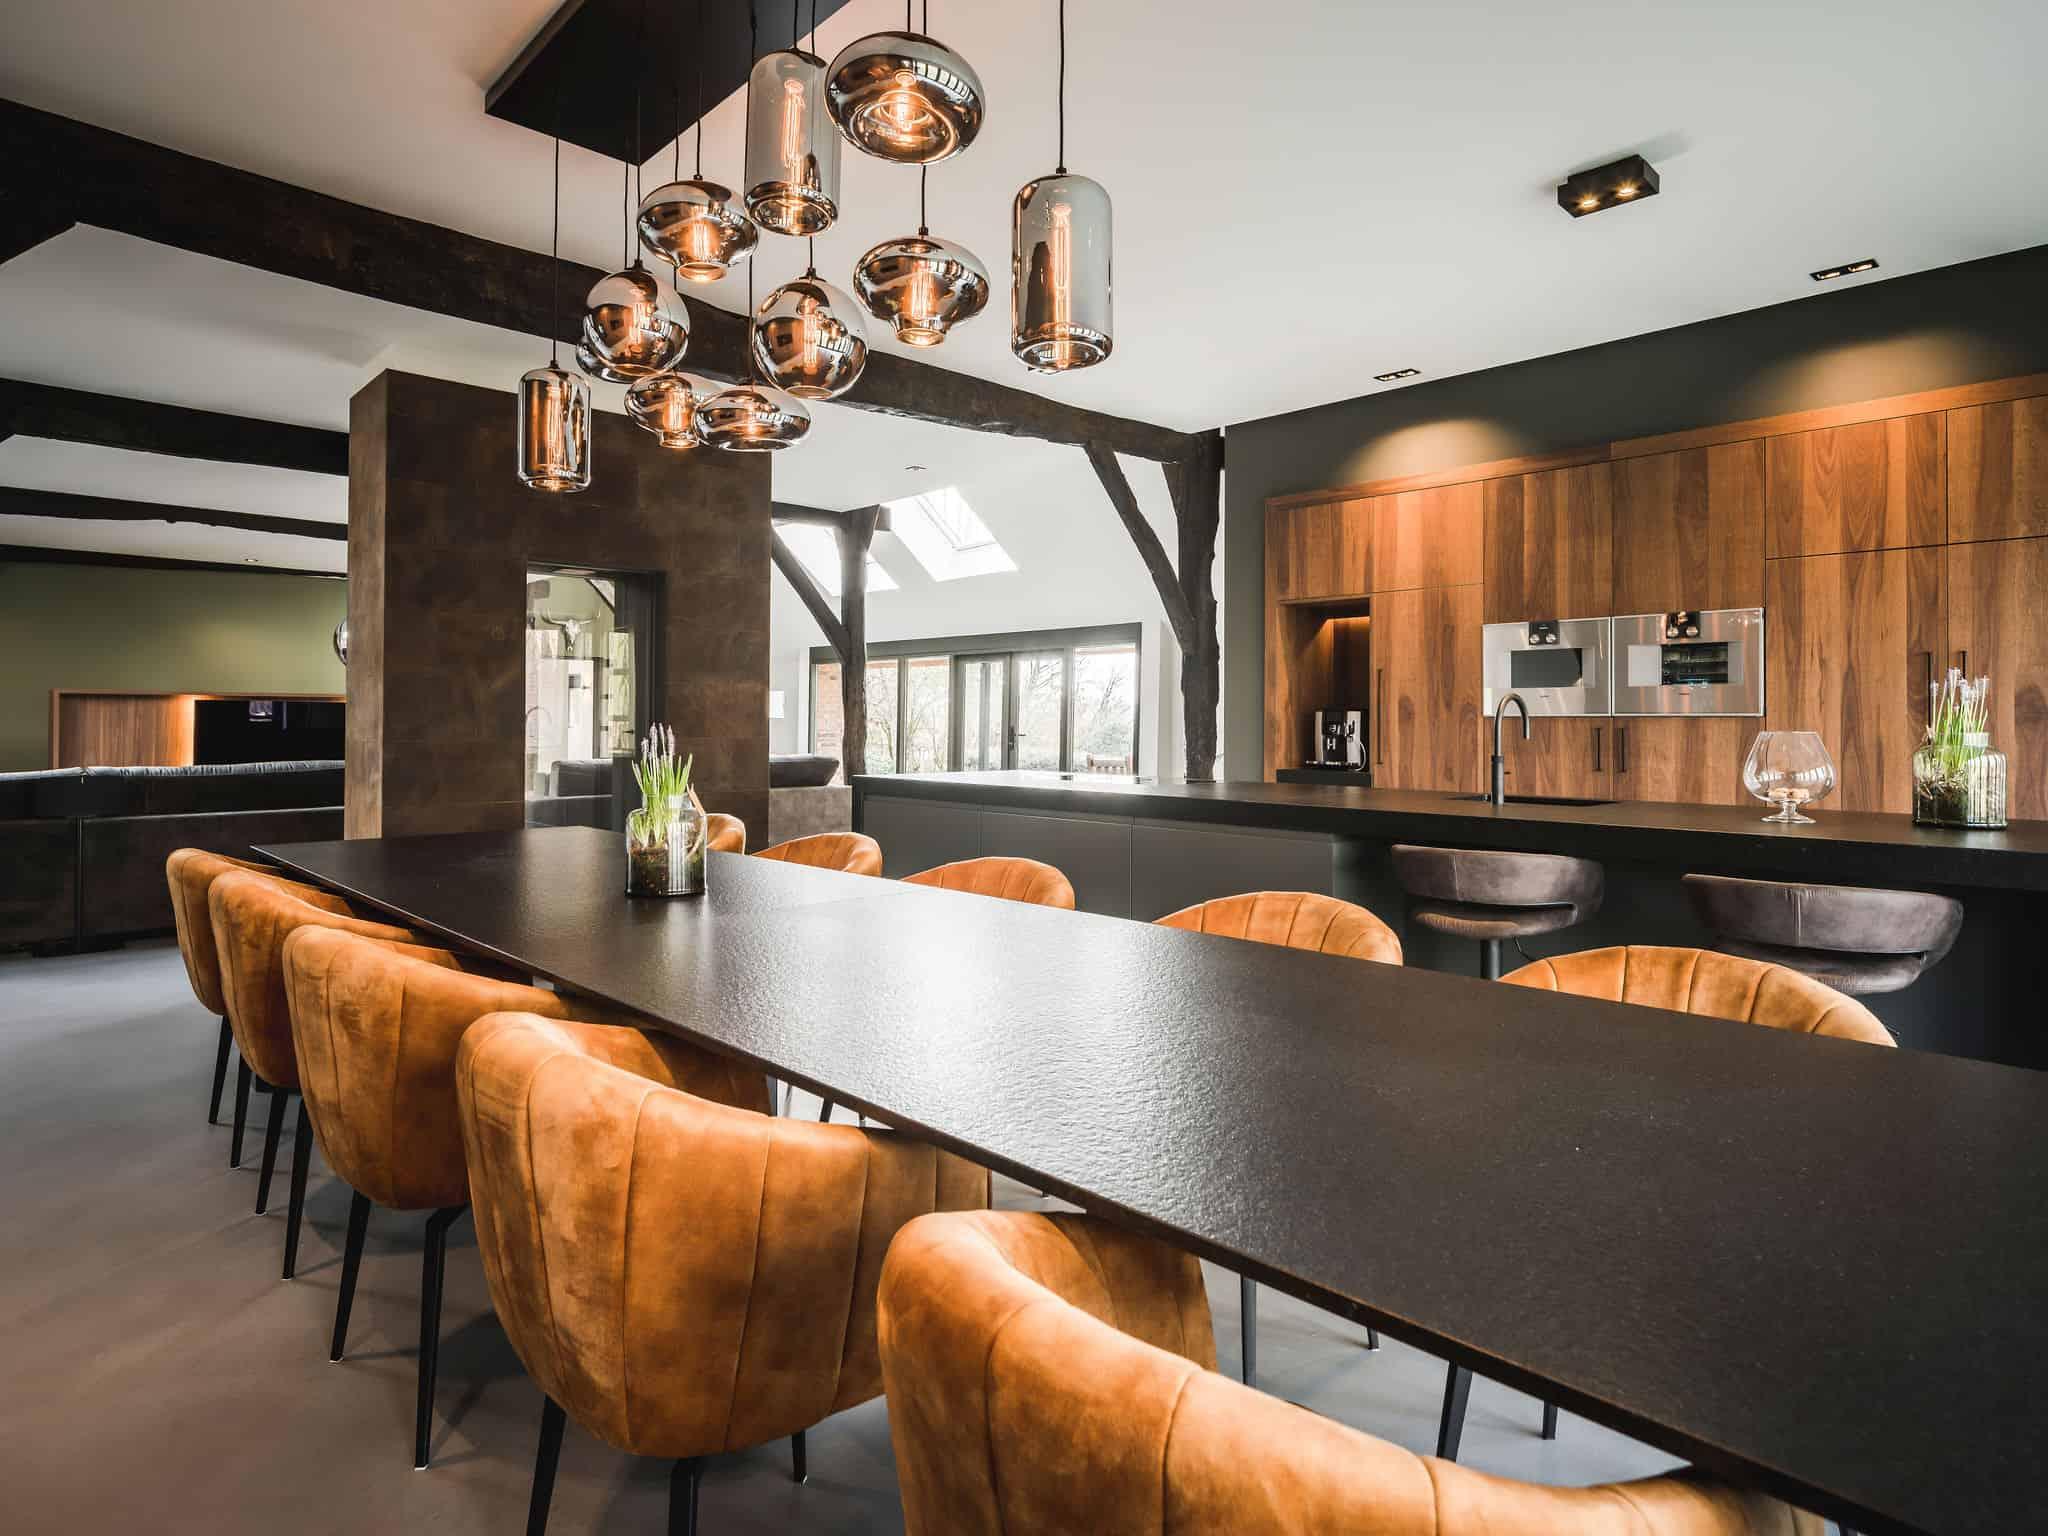 interieurarchitect Wildenberg ontwerp interieur woonboerderij Velux Eve Bulbs hanglampen M2 beton gietvloer Quooker Gaggenau maatwerk hout Shinokki keukenwand Abbel